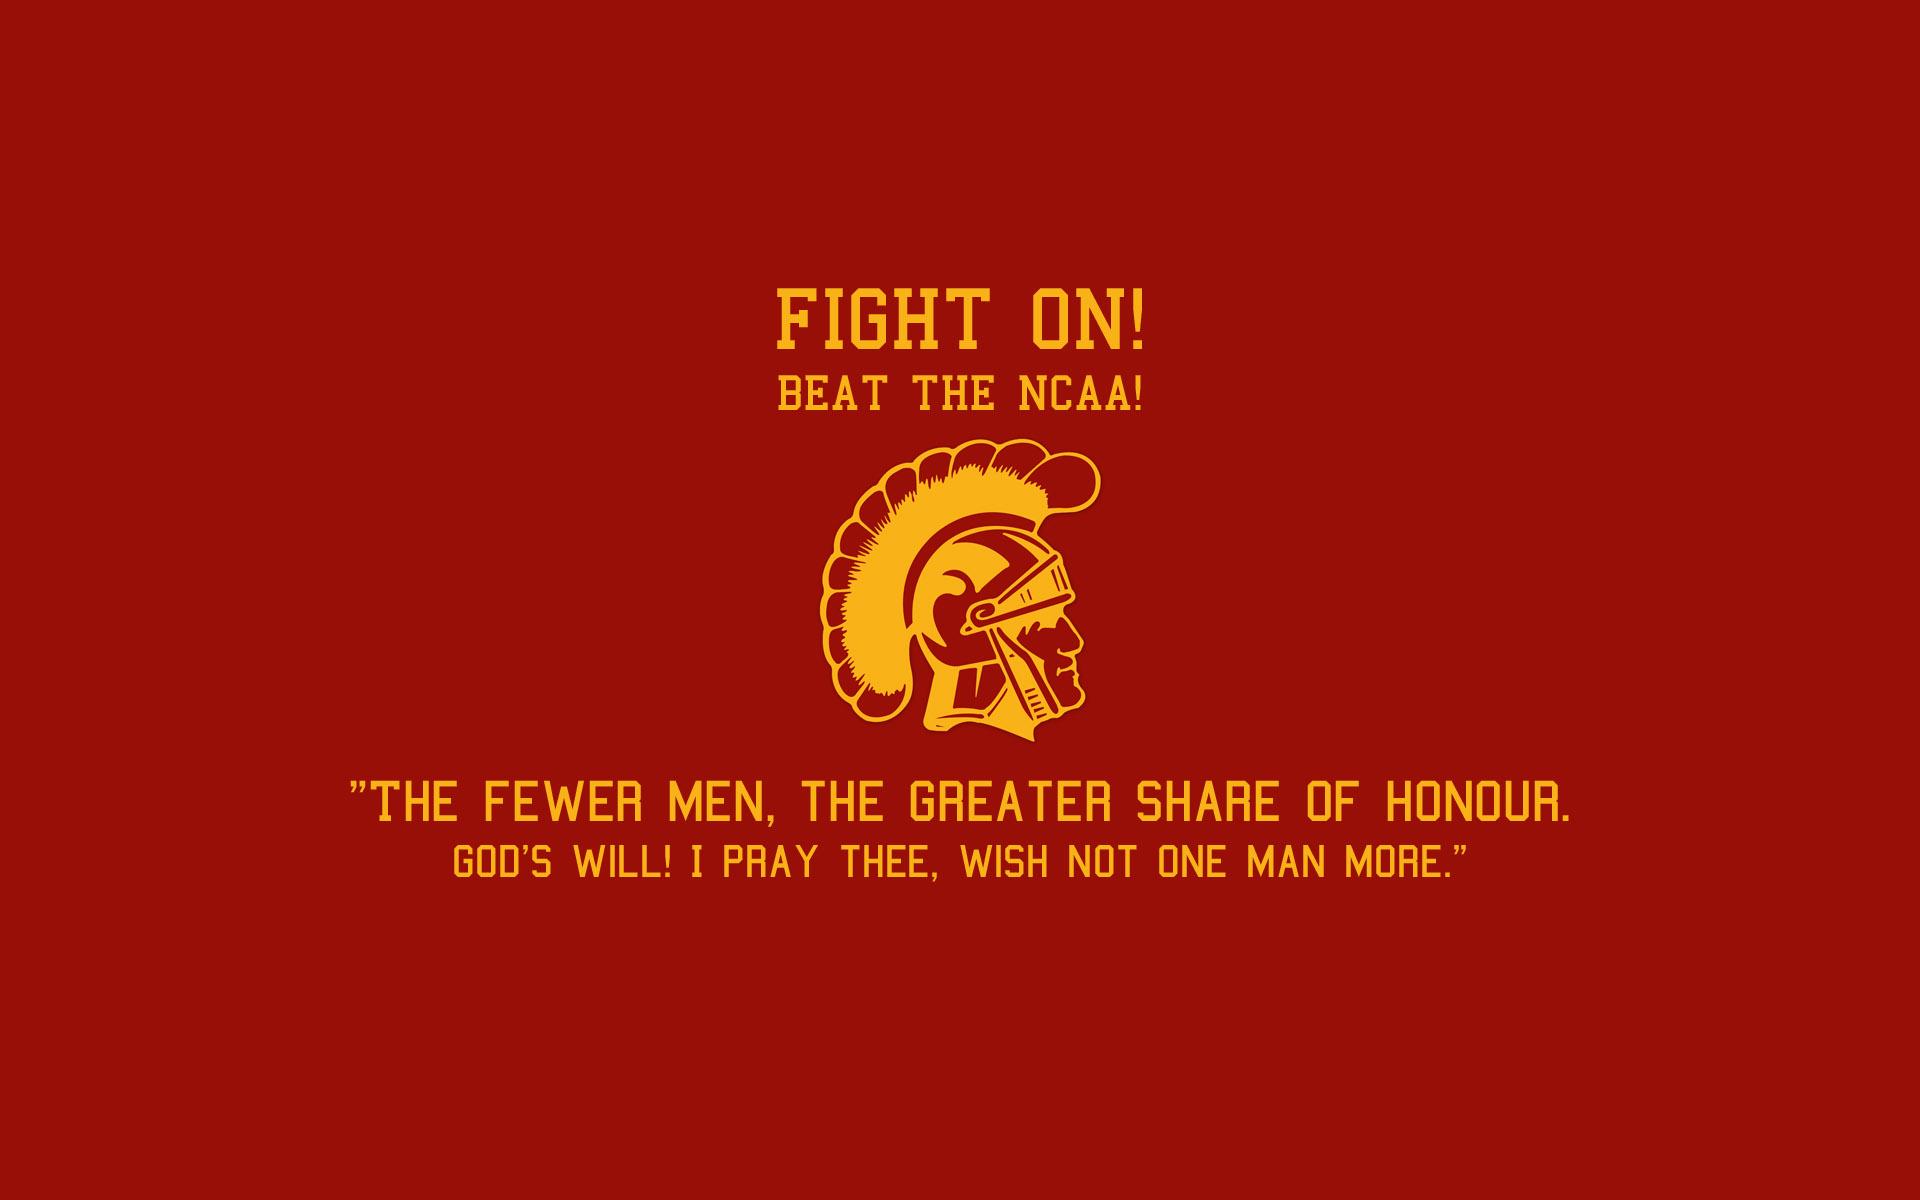 Usc Trojans Fight On Wallpaper USC Trojans Desktop Wa...